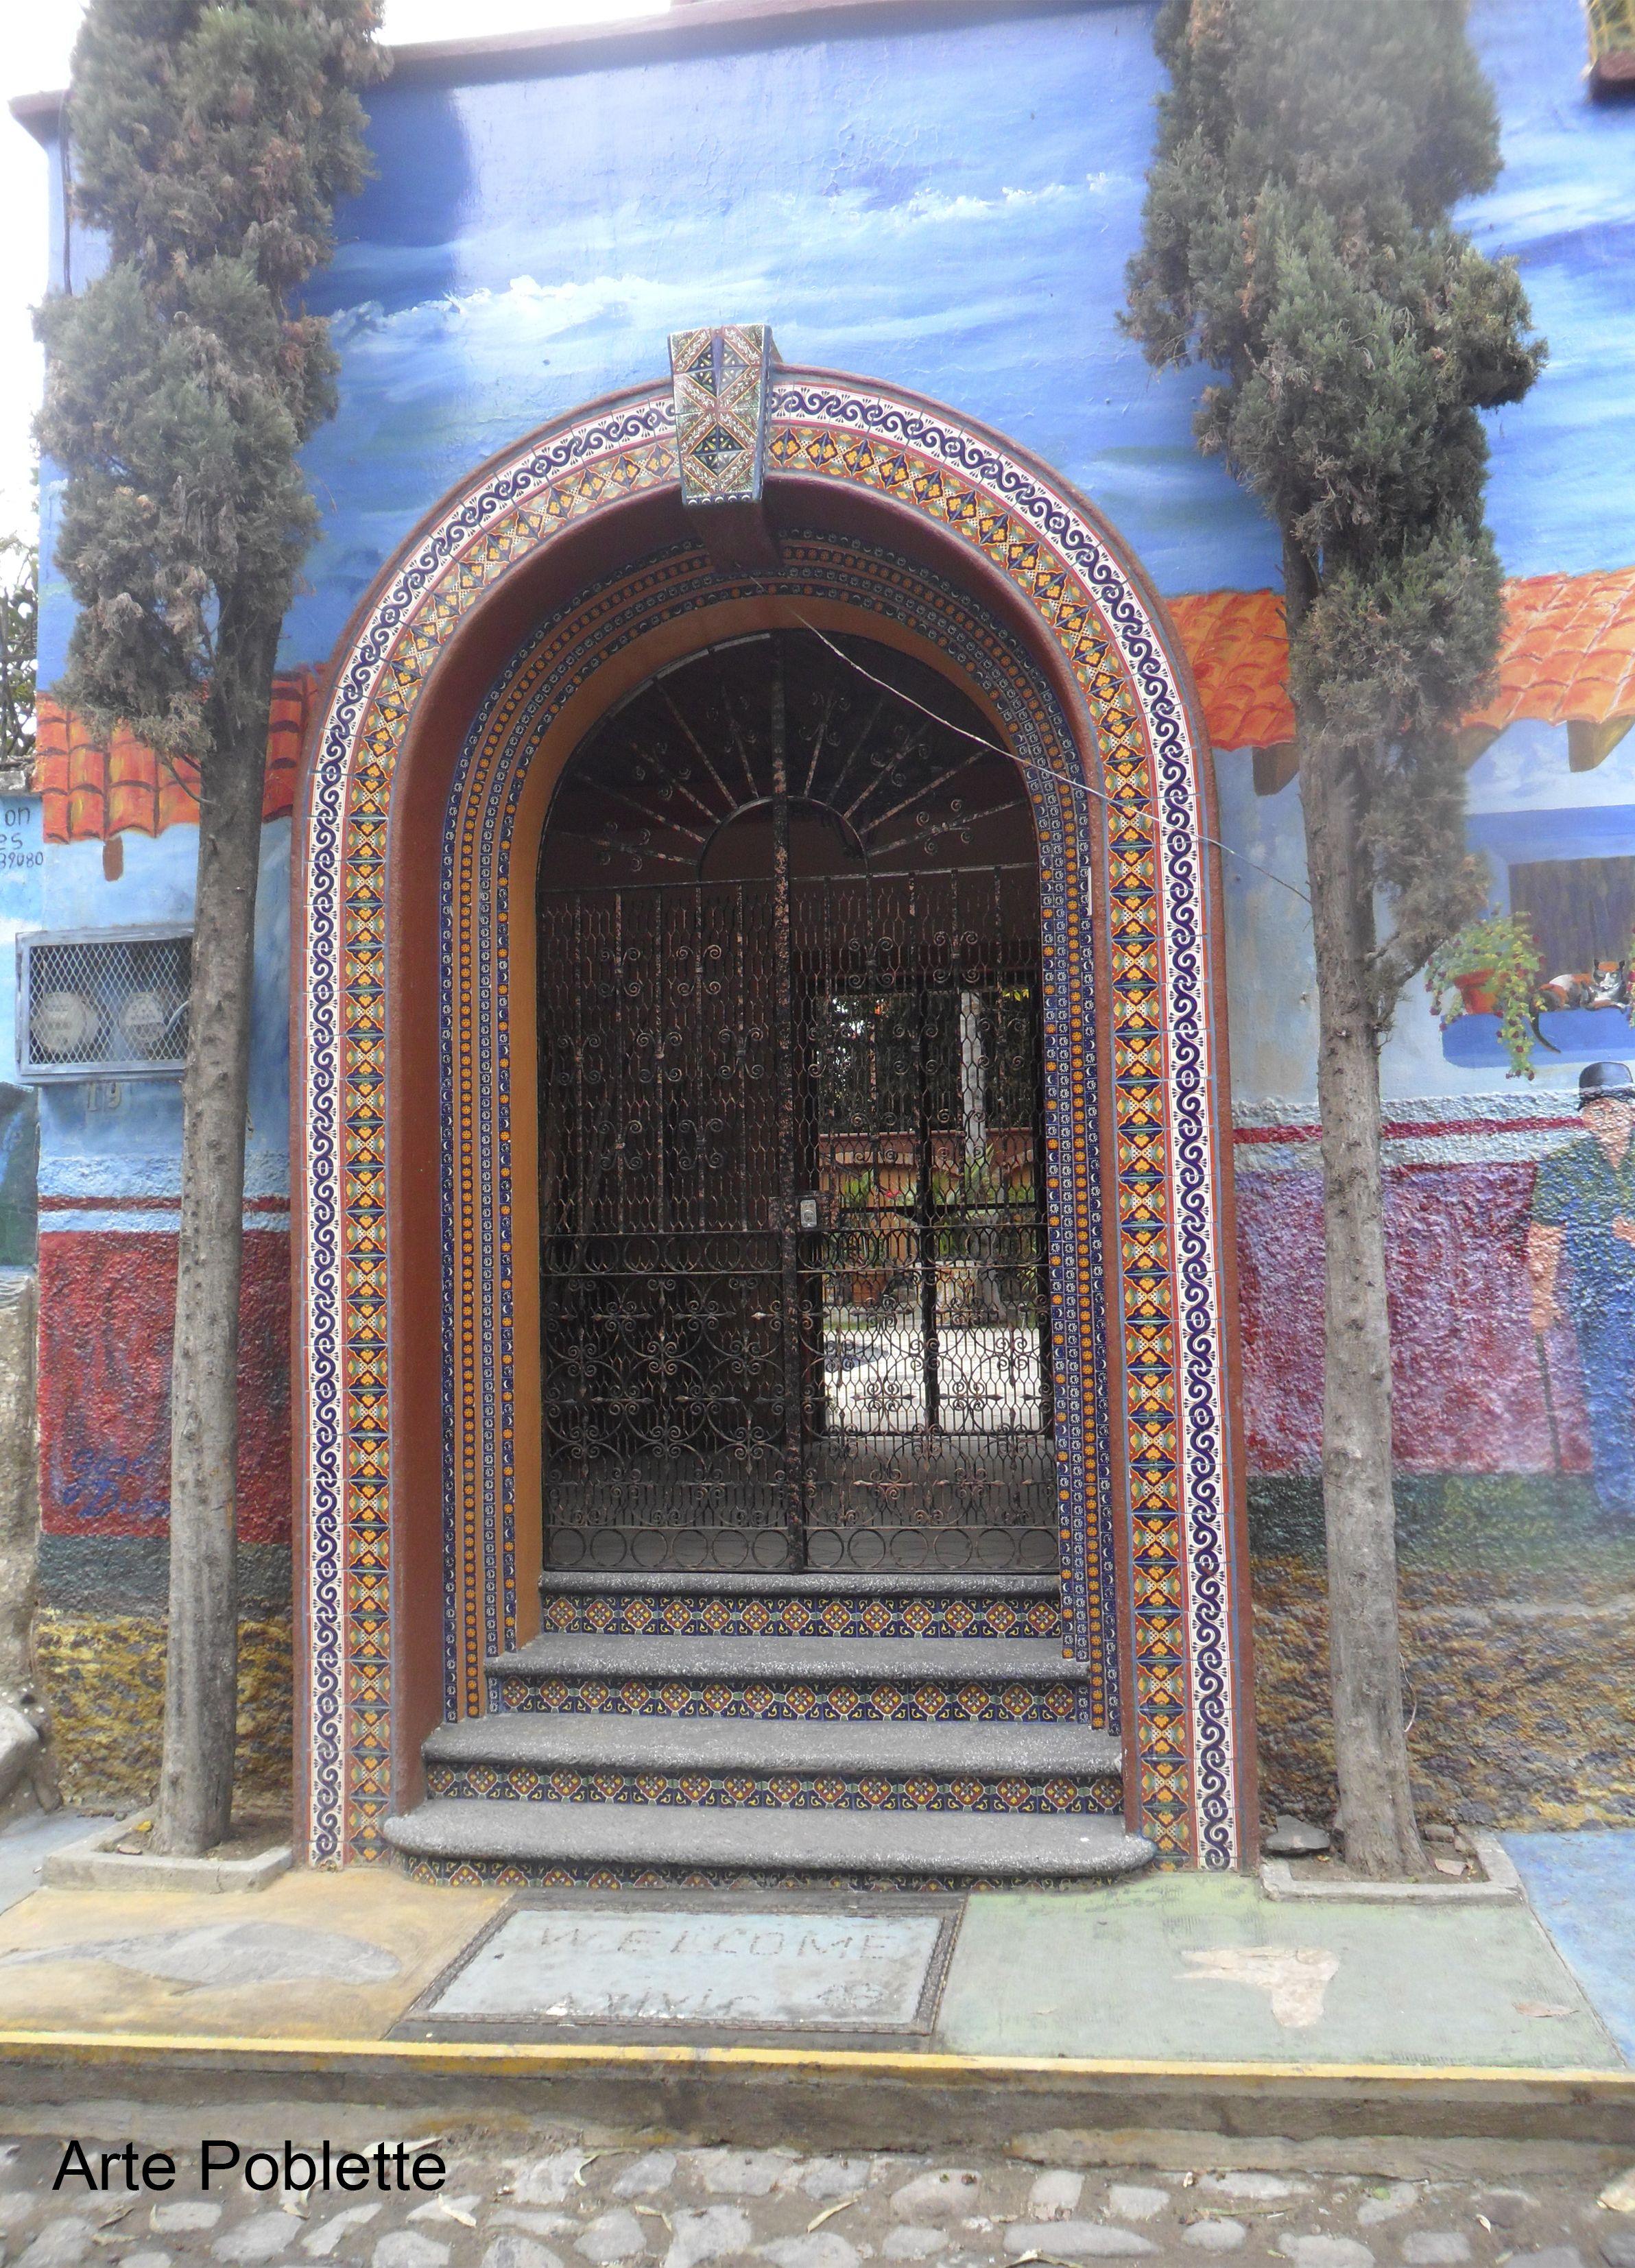 Puerta de Ajijic Jalisco, México 2015 Susana Soto Poblette